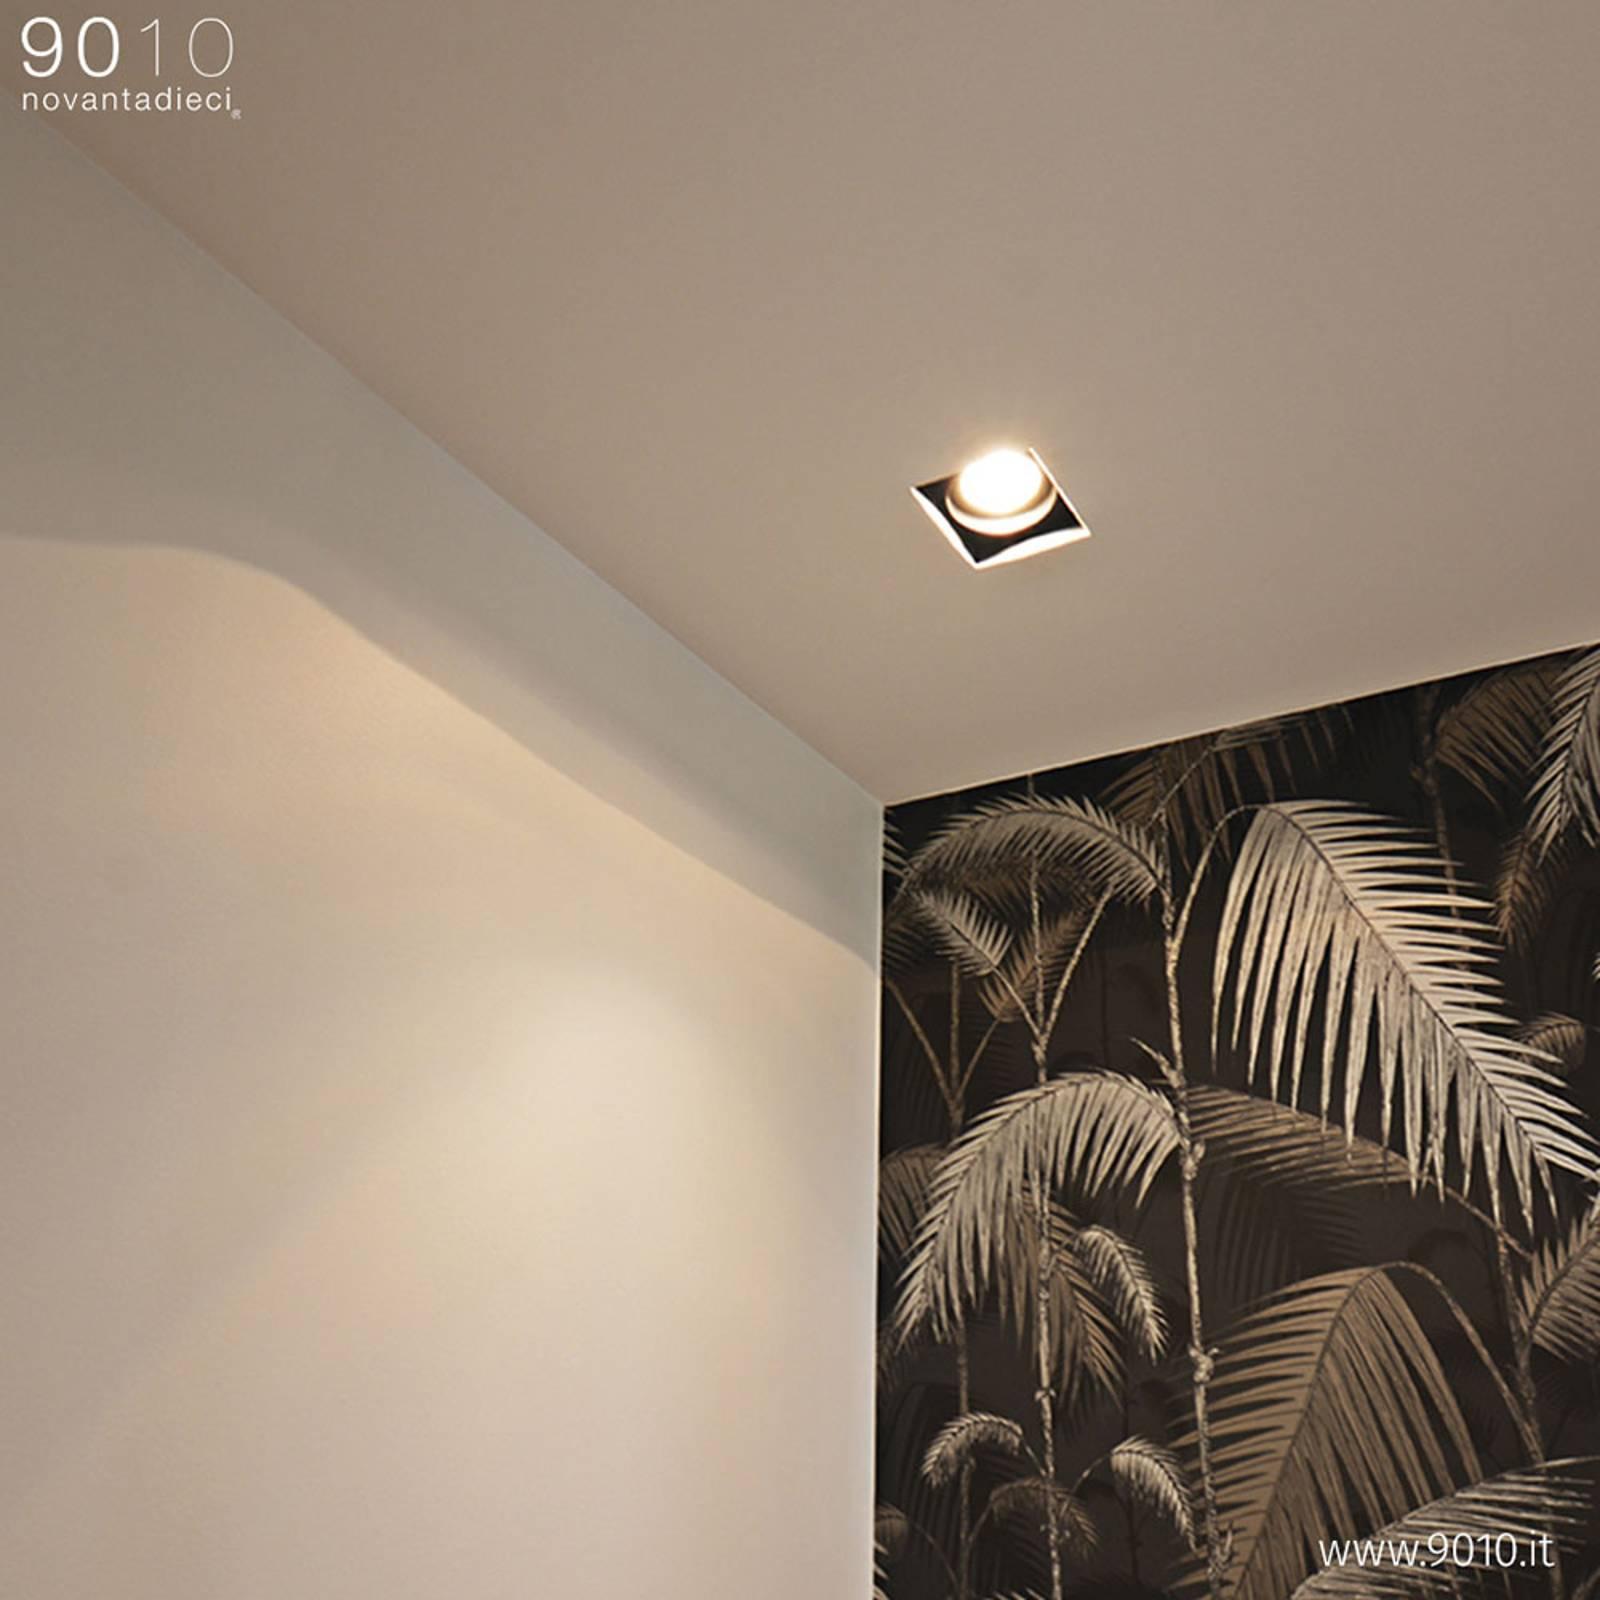 Bilde av Innbygget Taklampe 4246a, Firkantet, 15x15 Cm